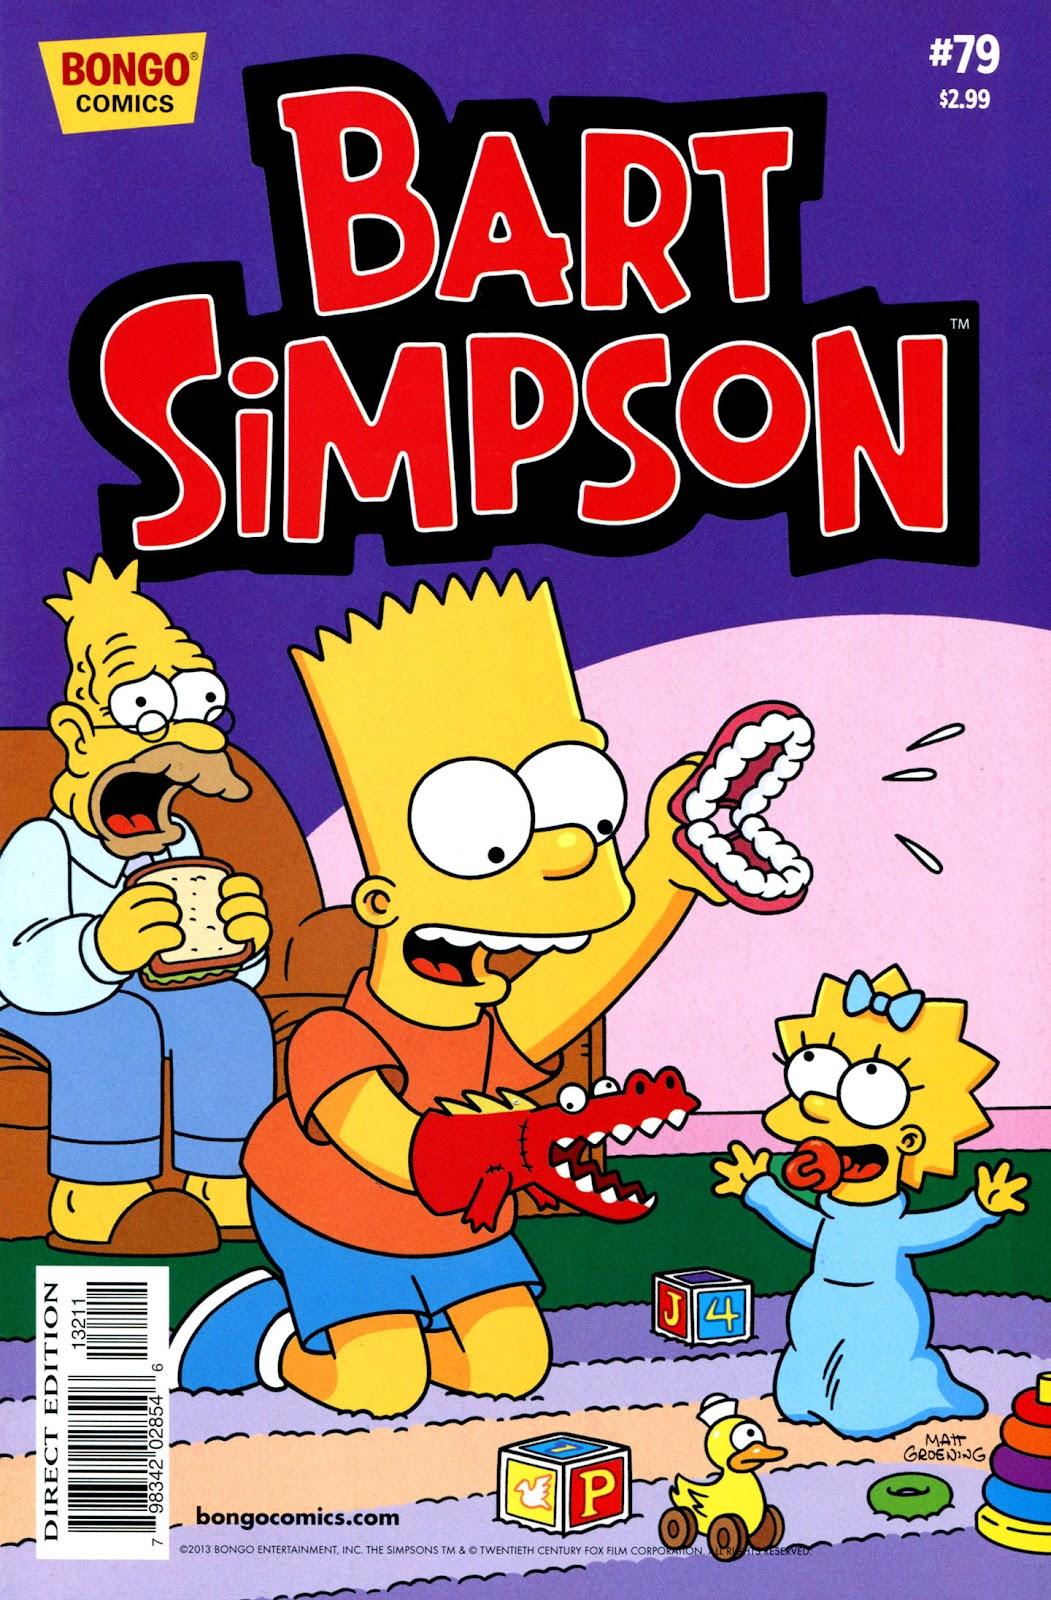 Simpsons Comics Presents Bart Simpson 79 Page 1